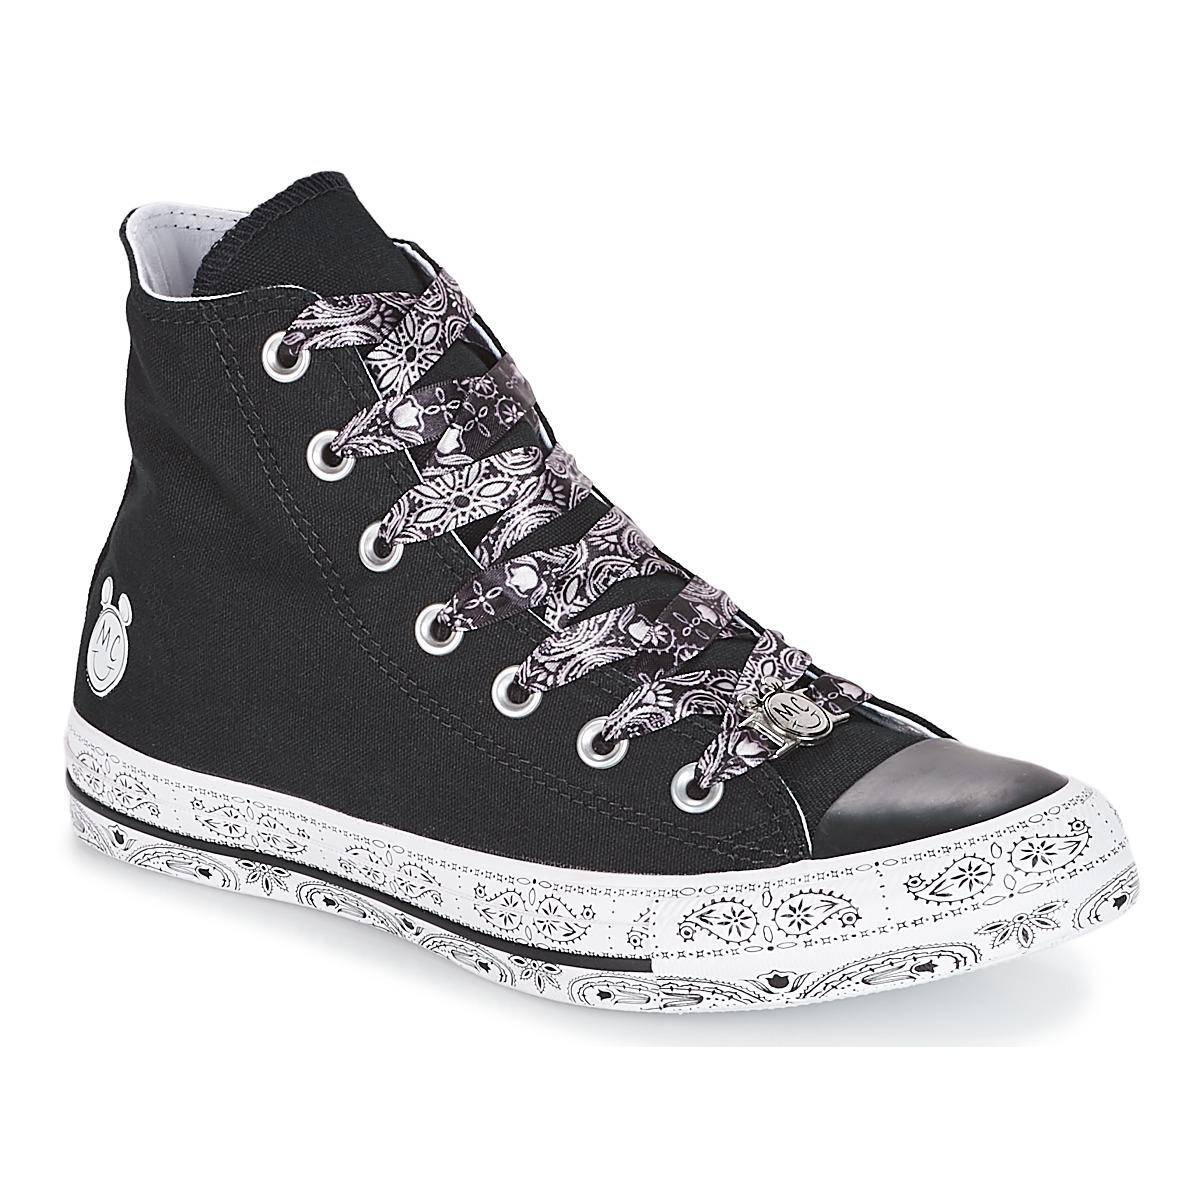 ab087aafb2 Converse Chuck Taylor All Star-hi Miley Cyrus Women s Shoes (high ...